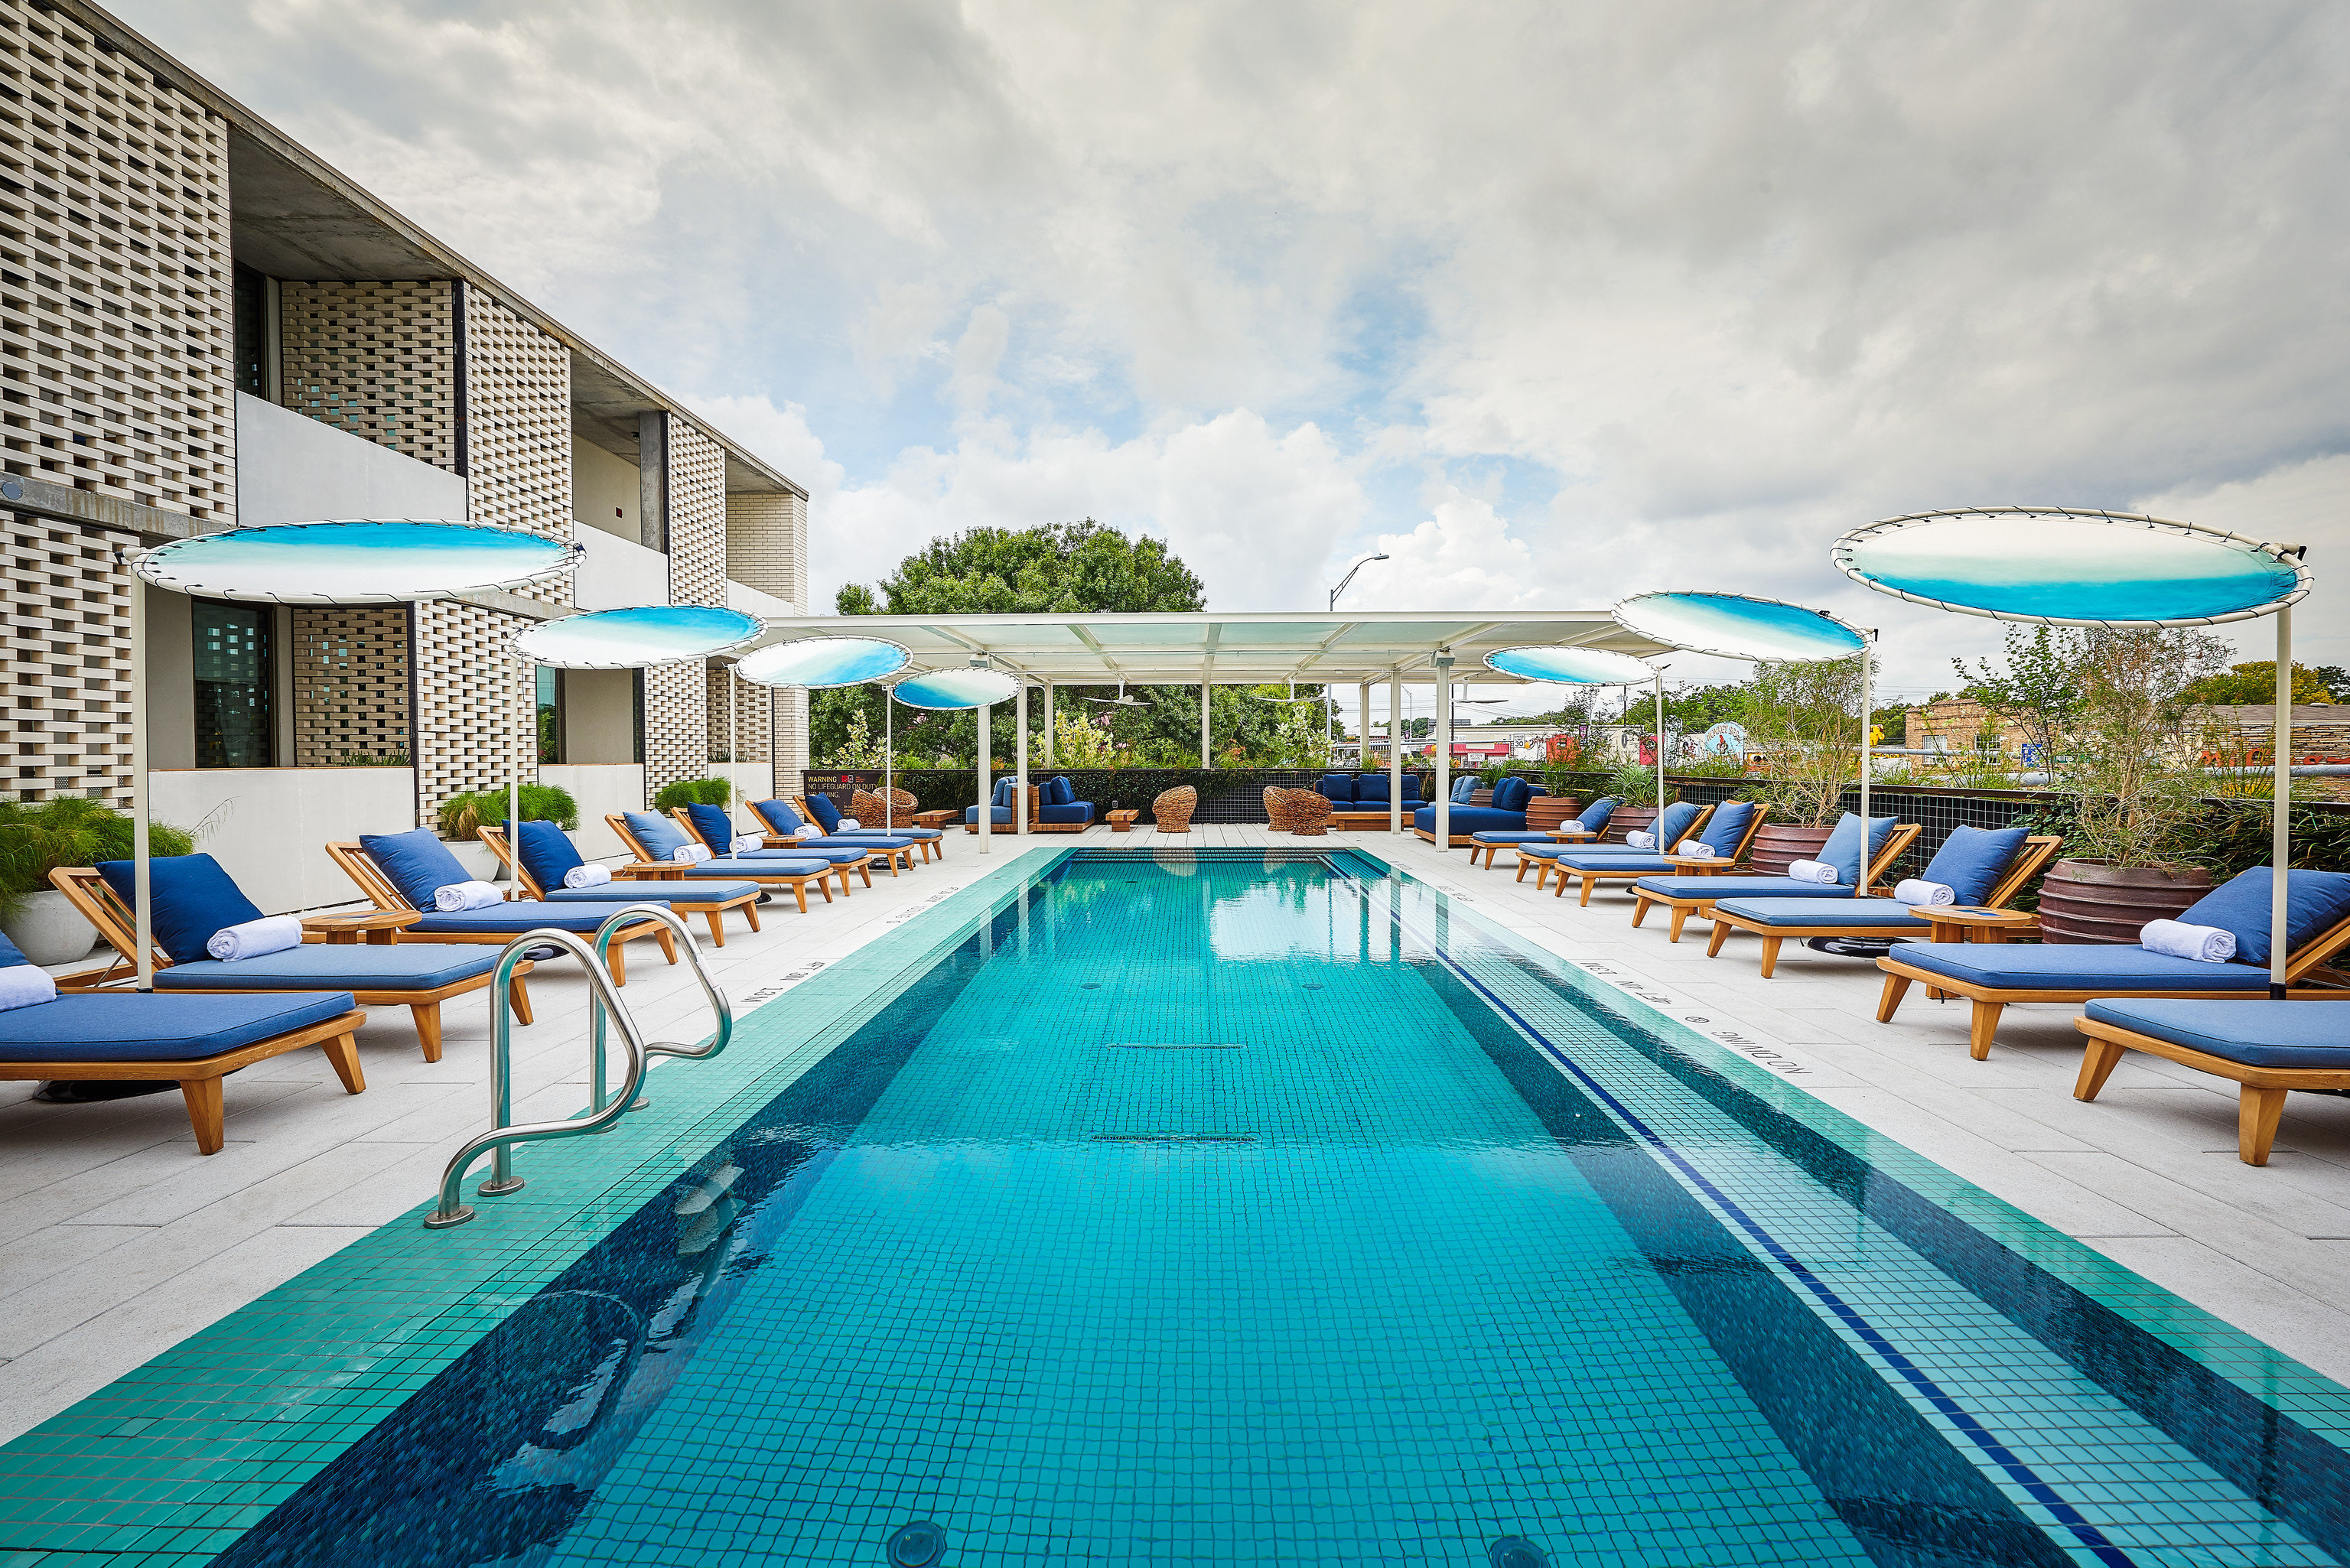 Austin Texas Beach Resorts The Best Beaches In World